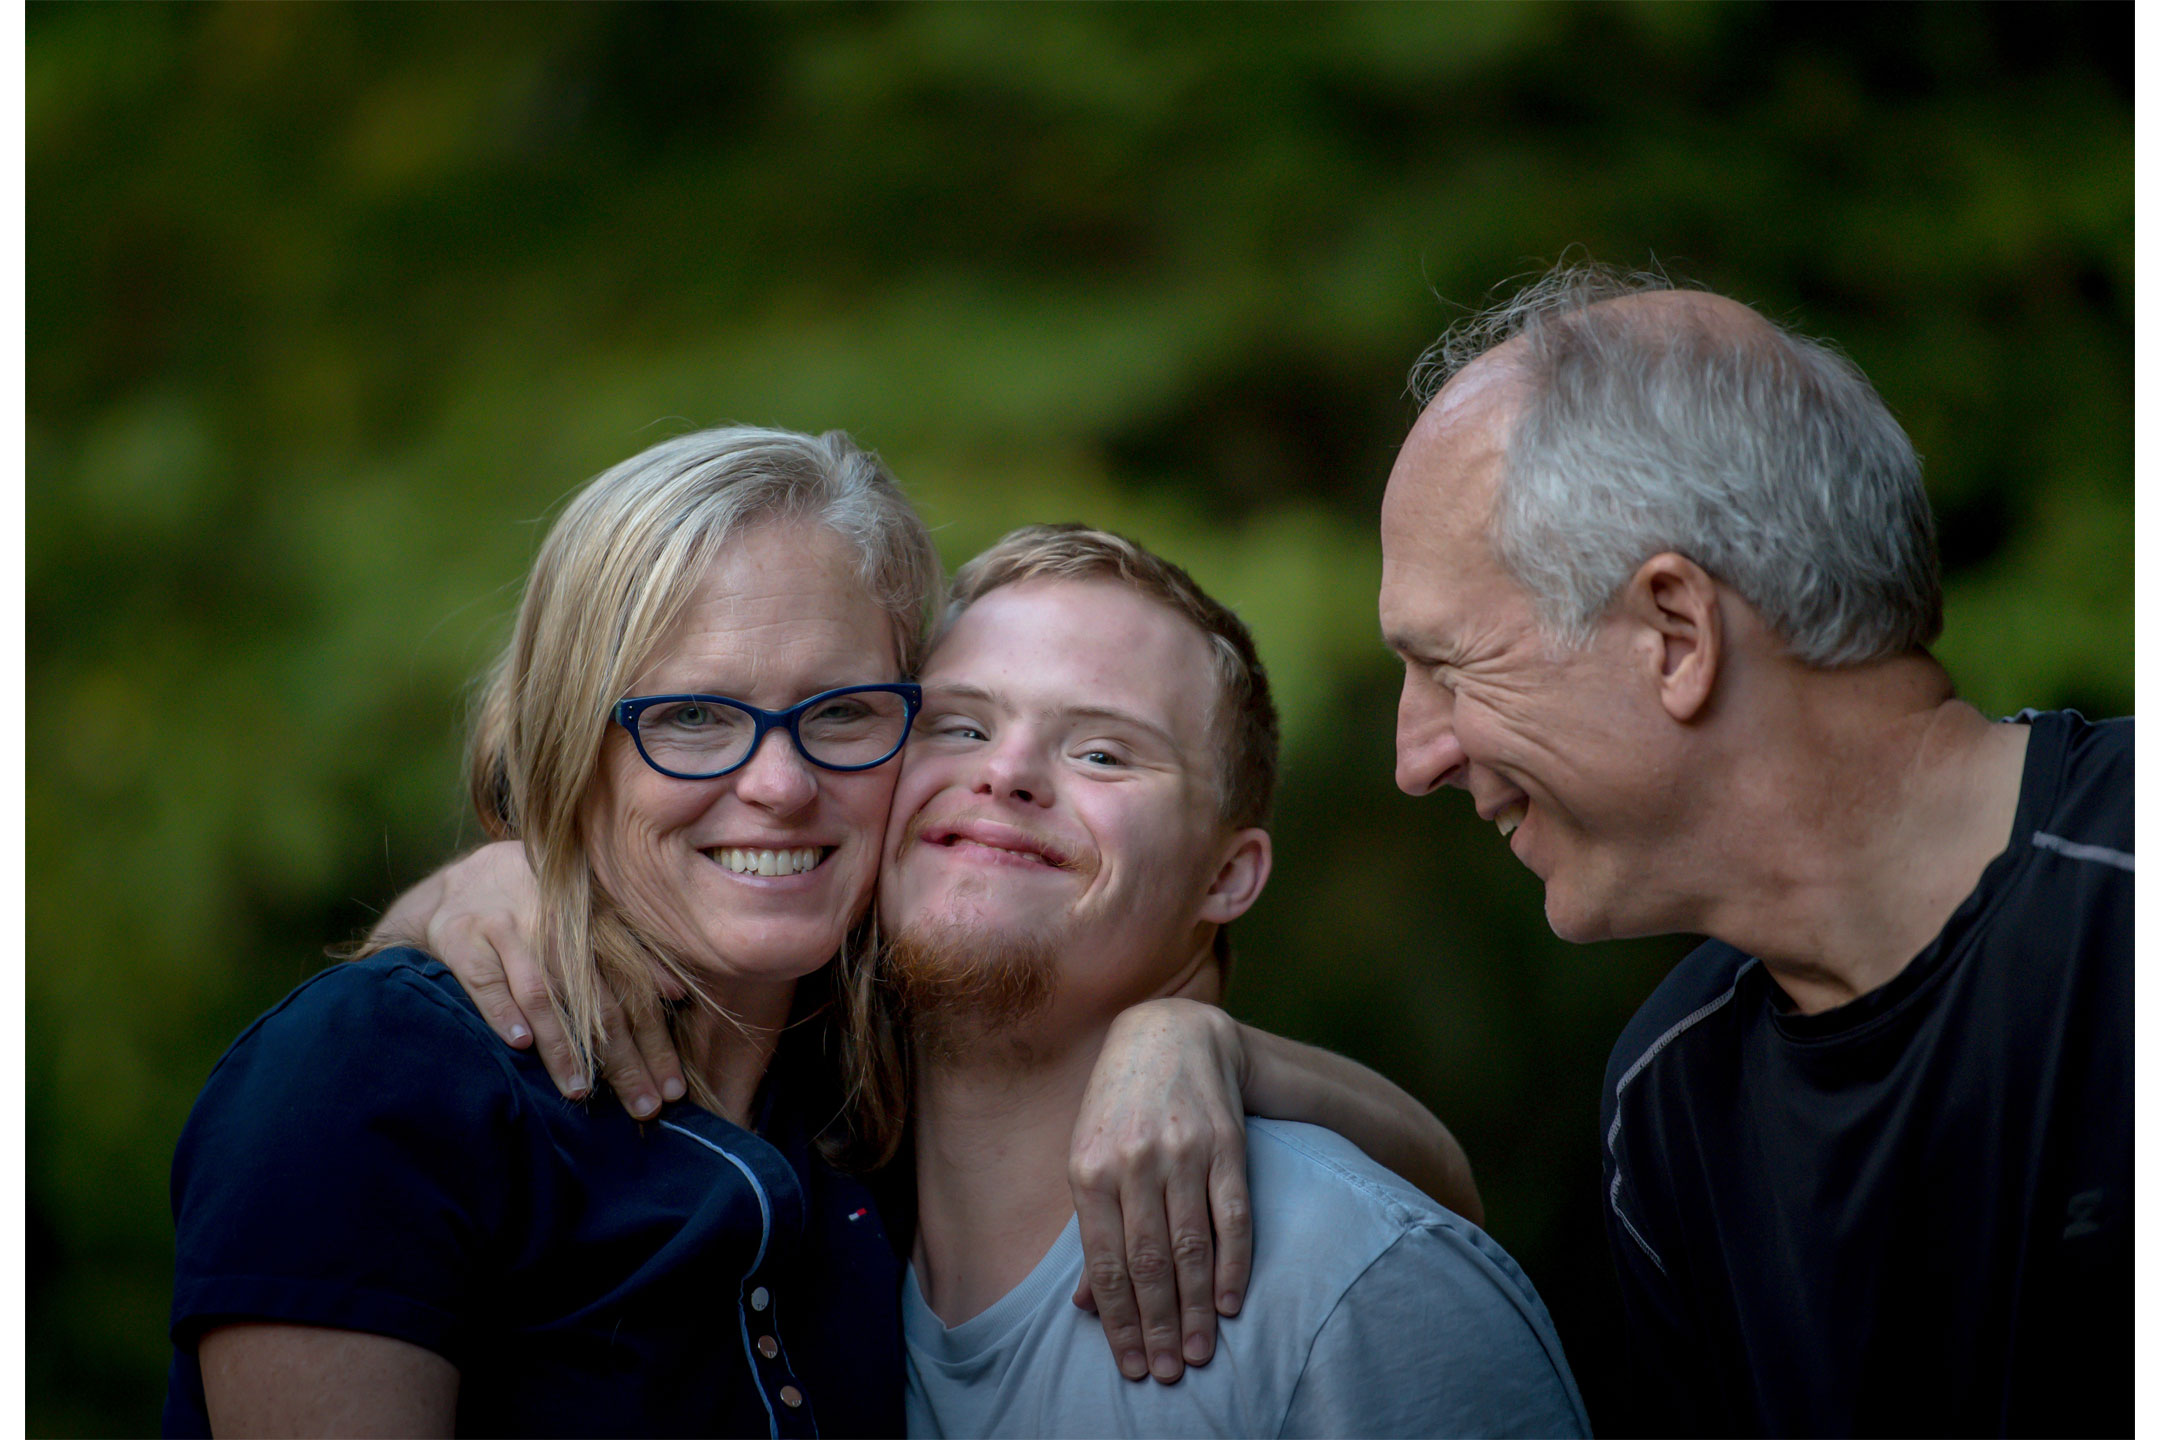 Down-syndrome-family2160